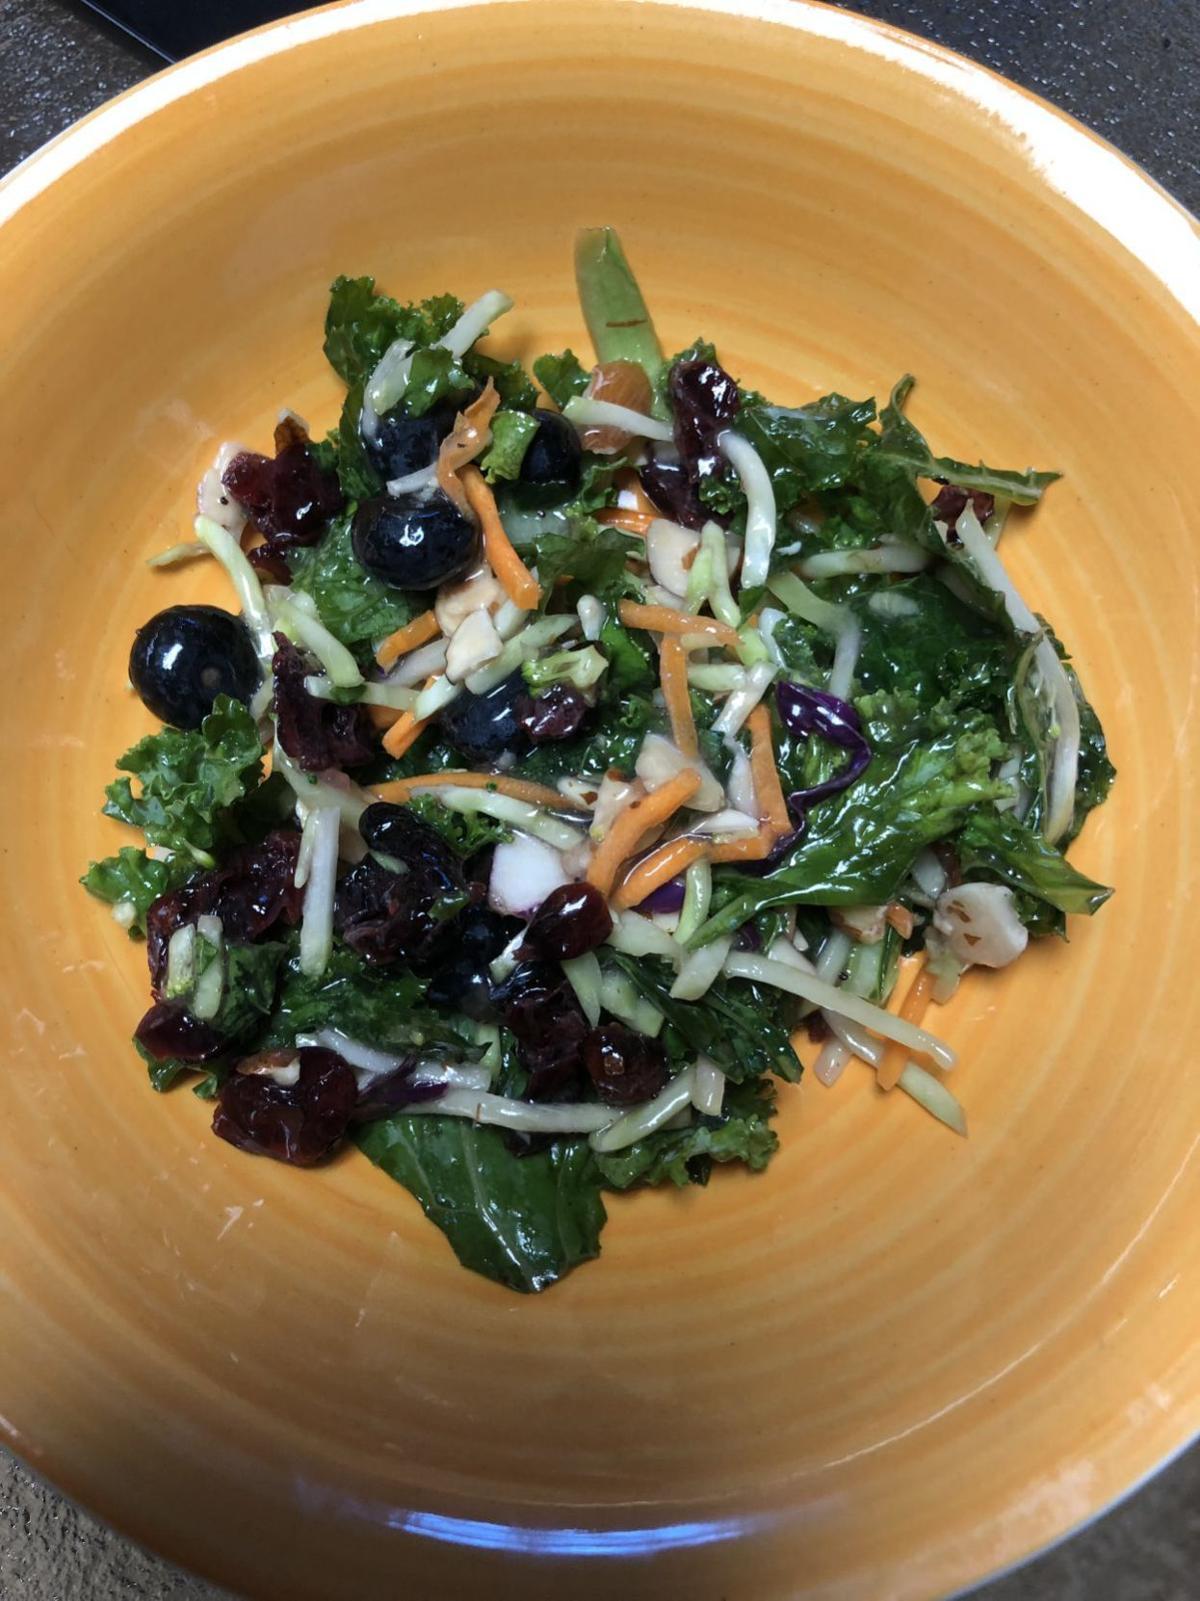 KIF Kale salad